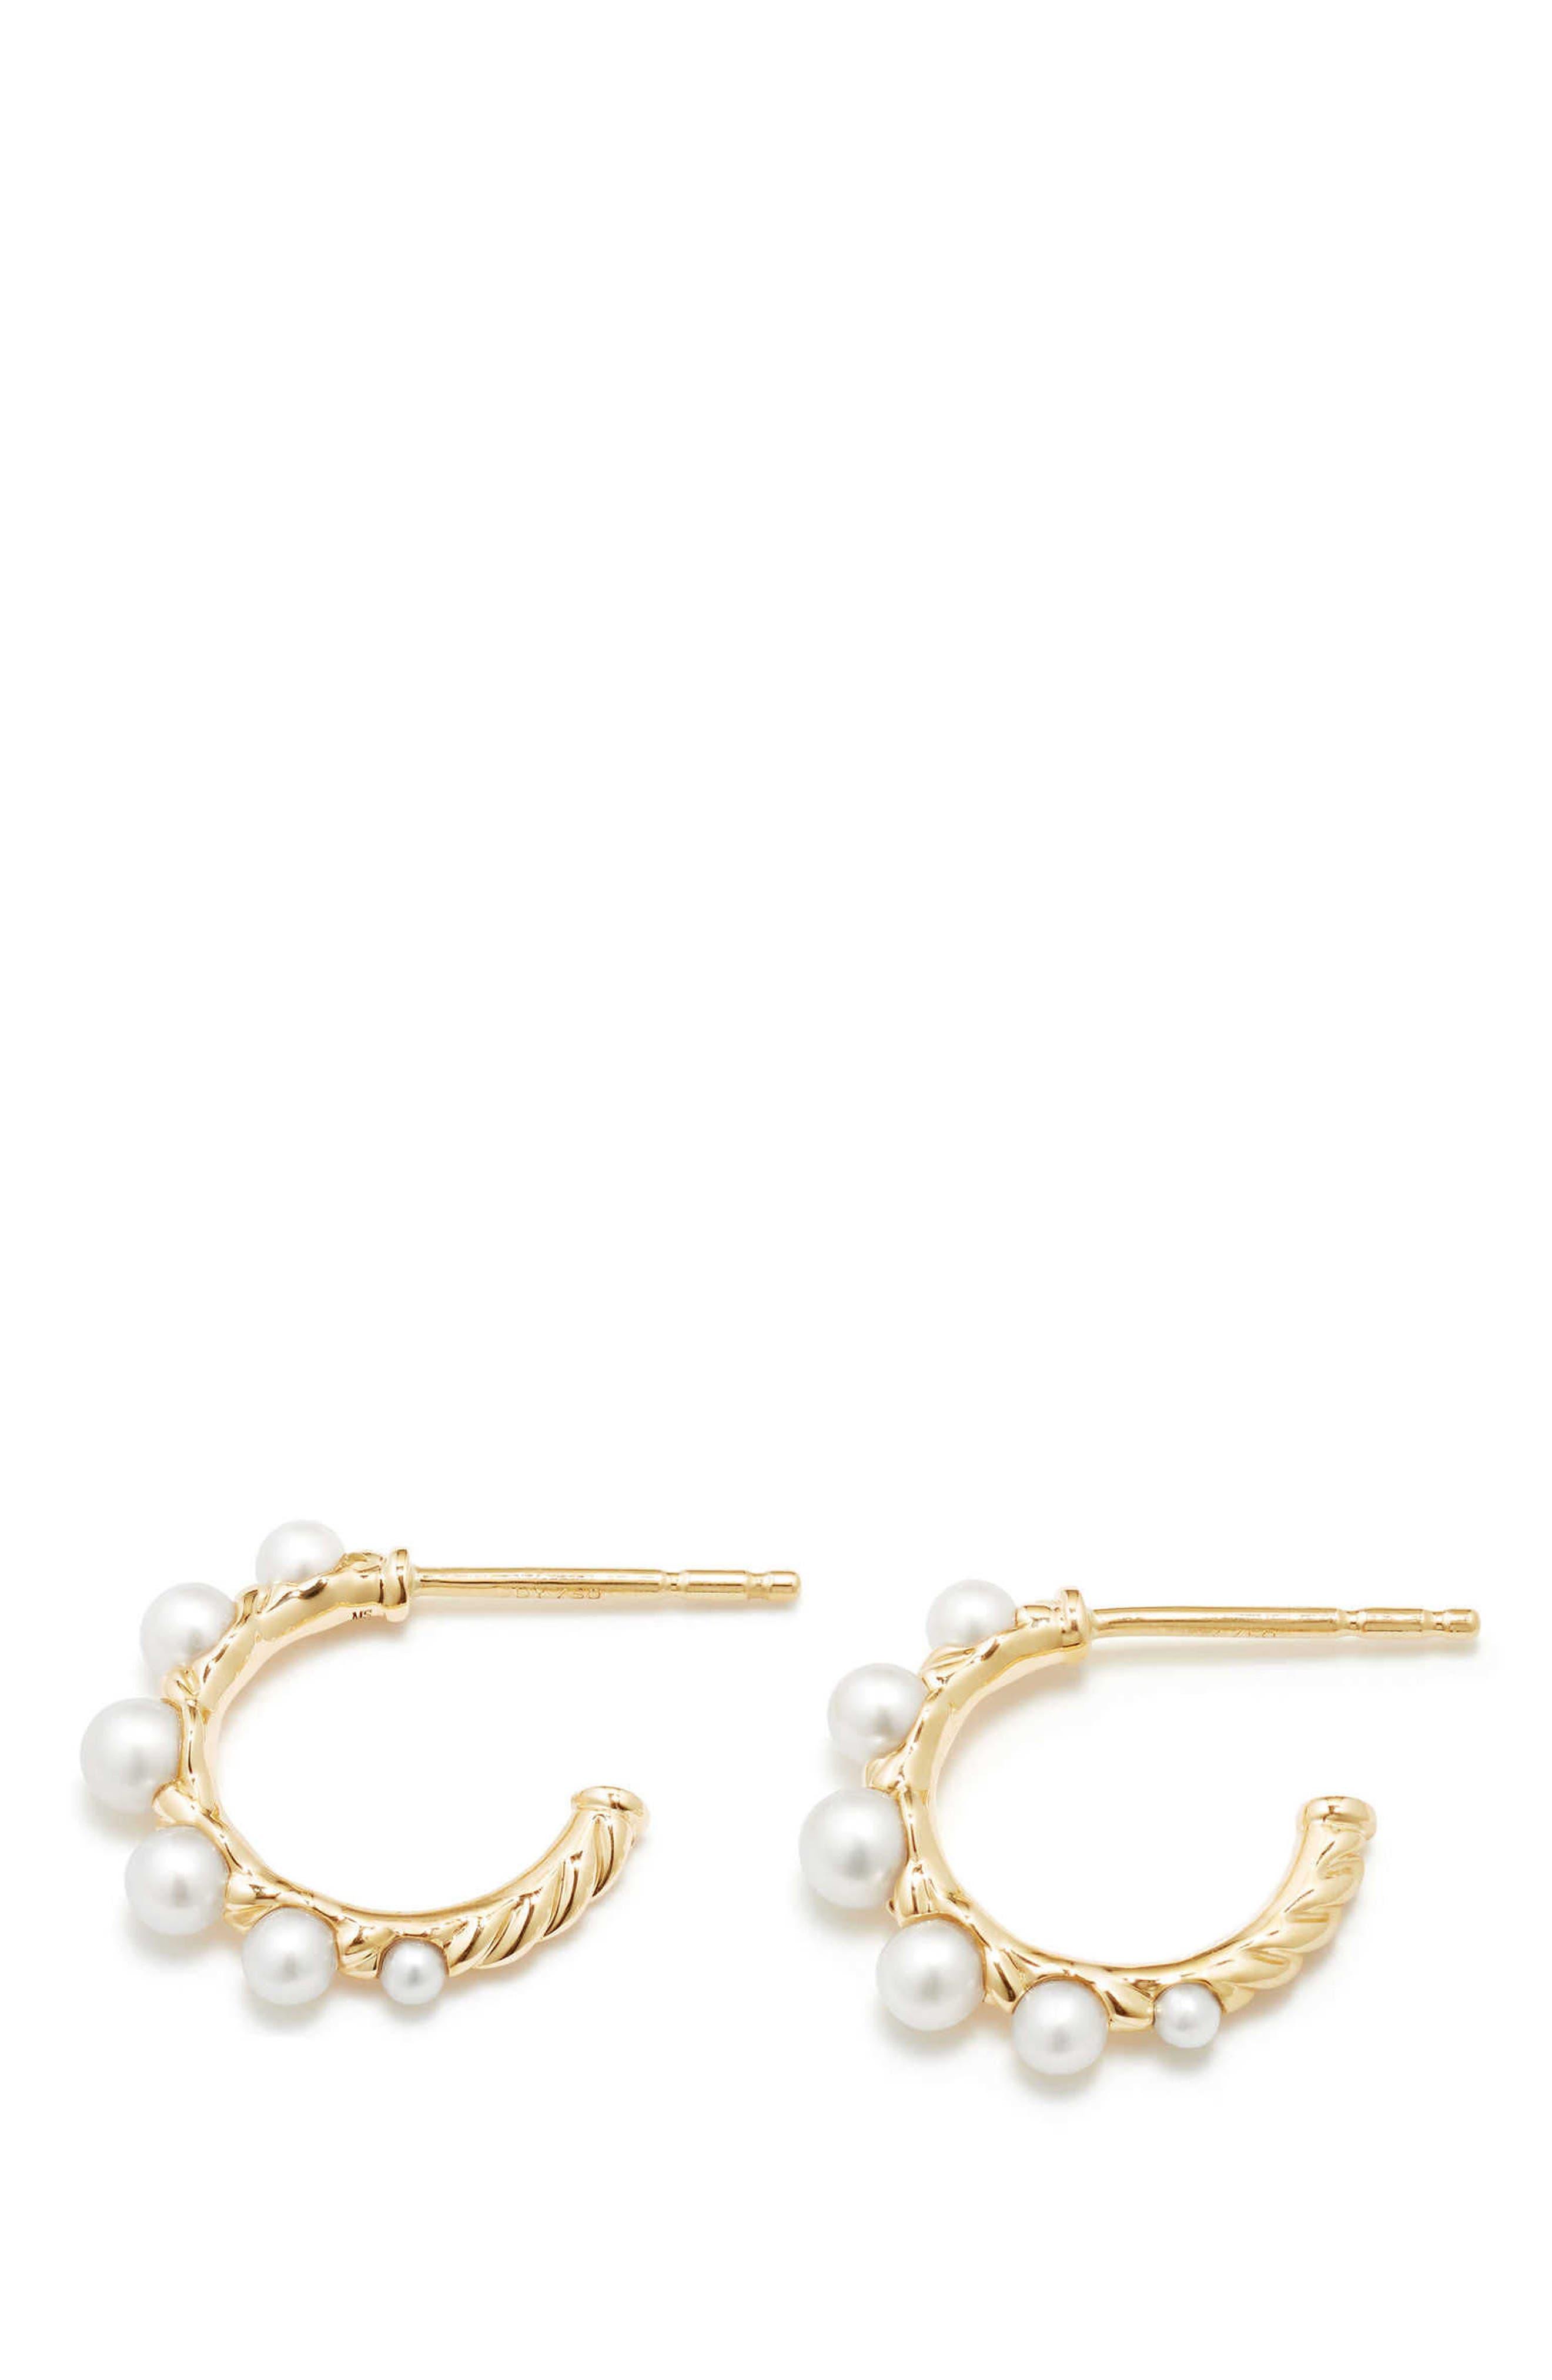 Petite Perle Graduated Pearl Hoop Earrings in 18K Gold,                             Main thumbnail 1, color,                             GOLD/ PEARL